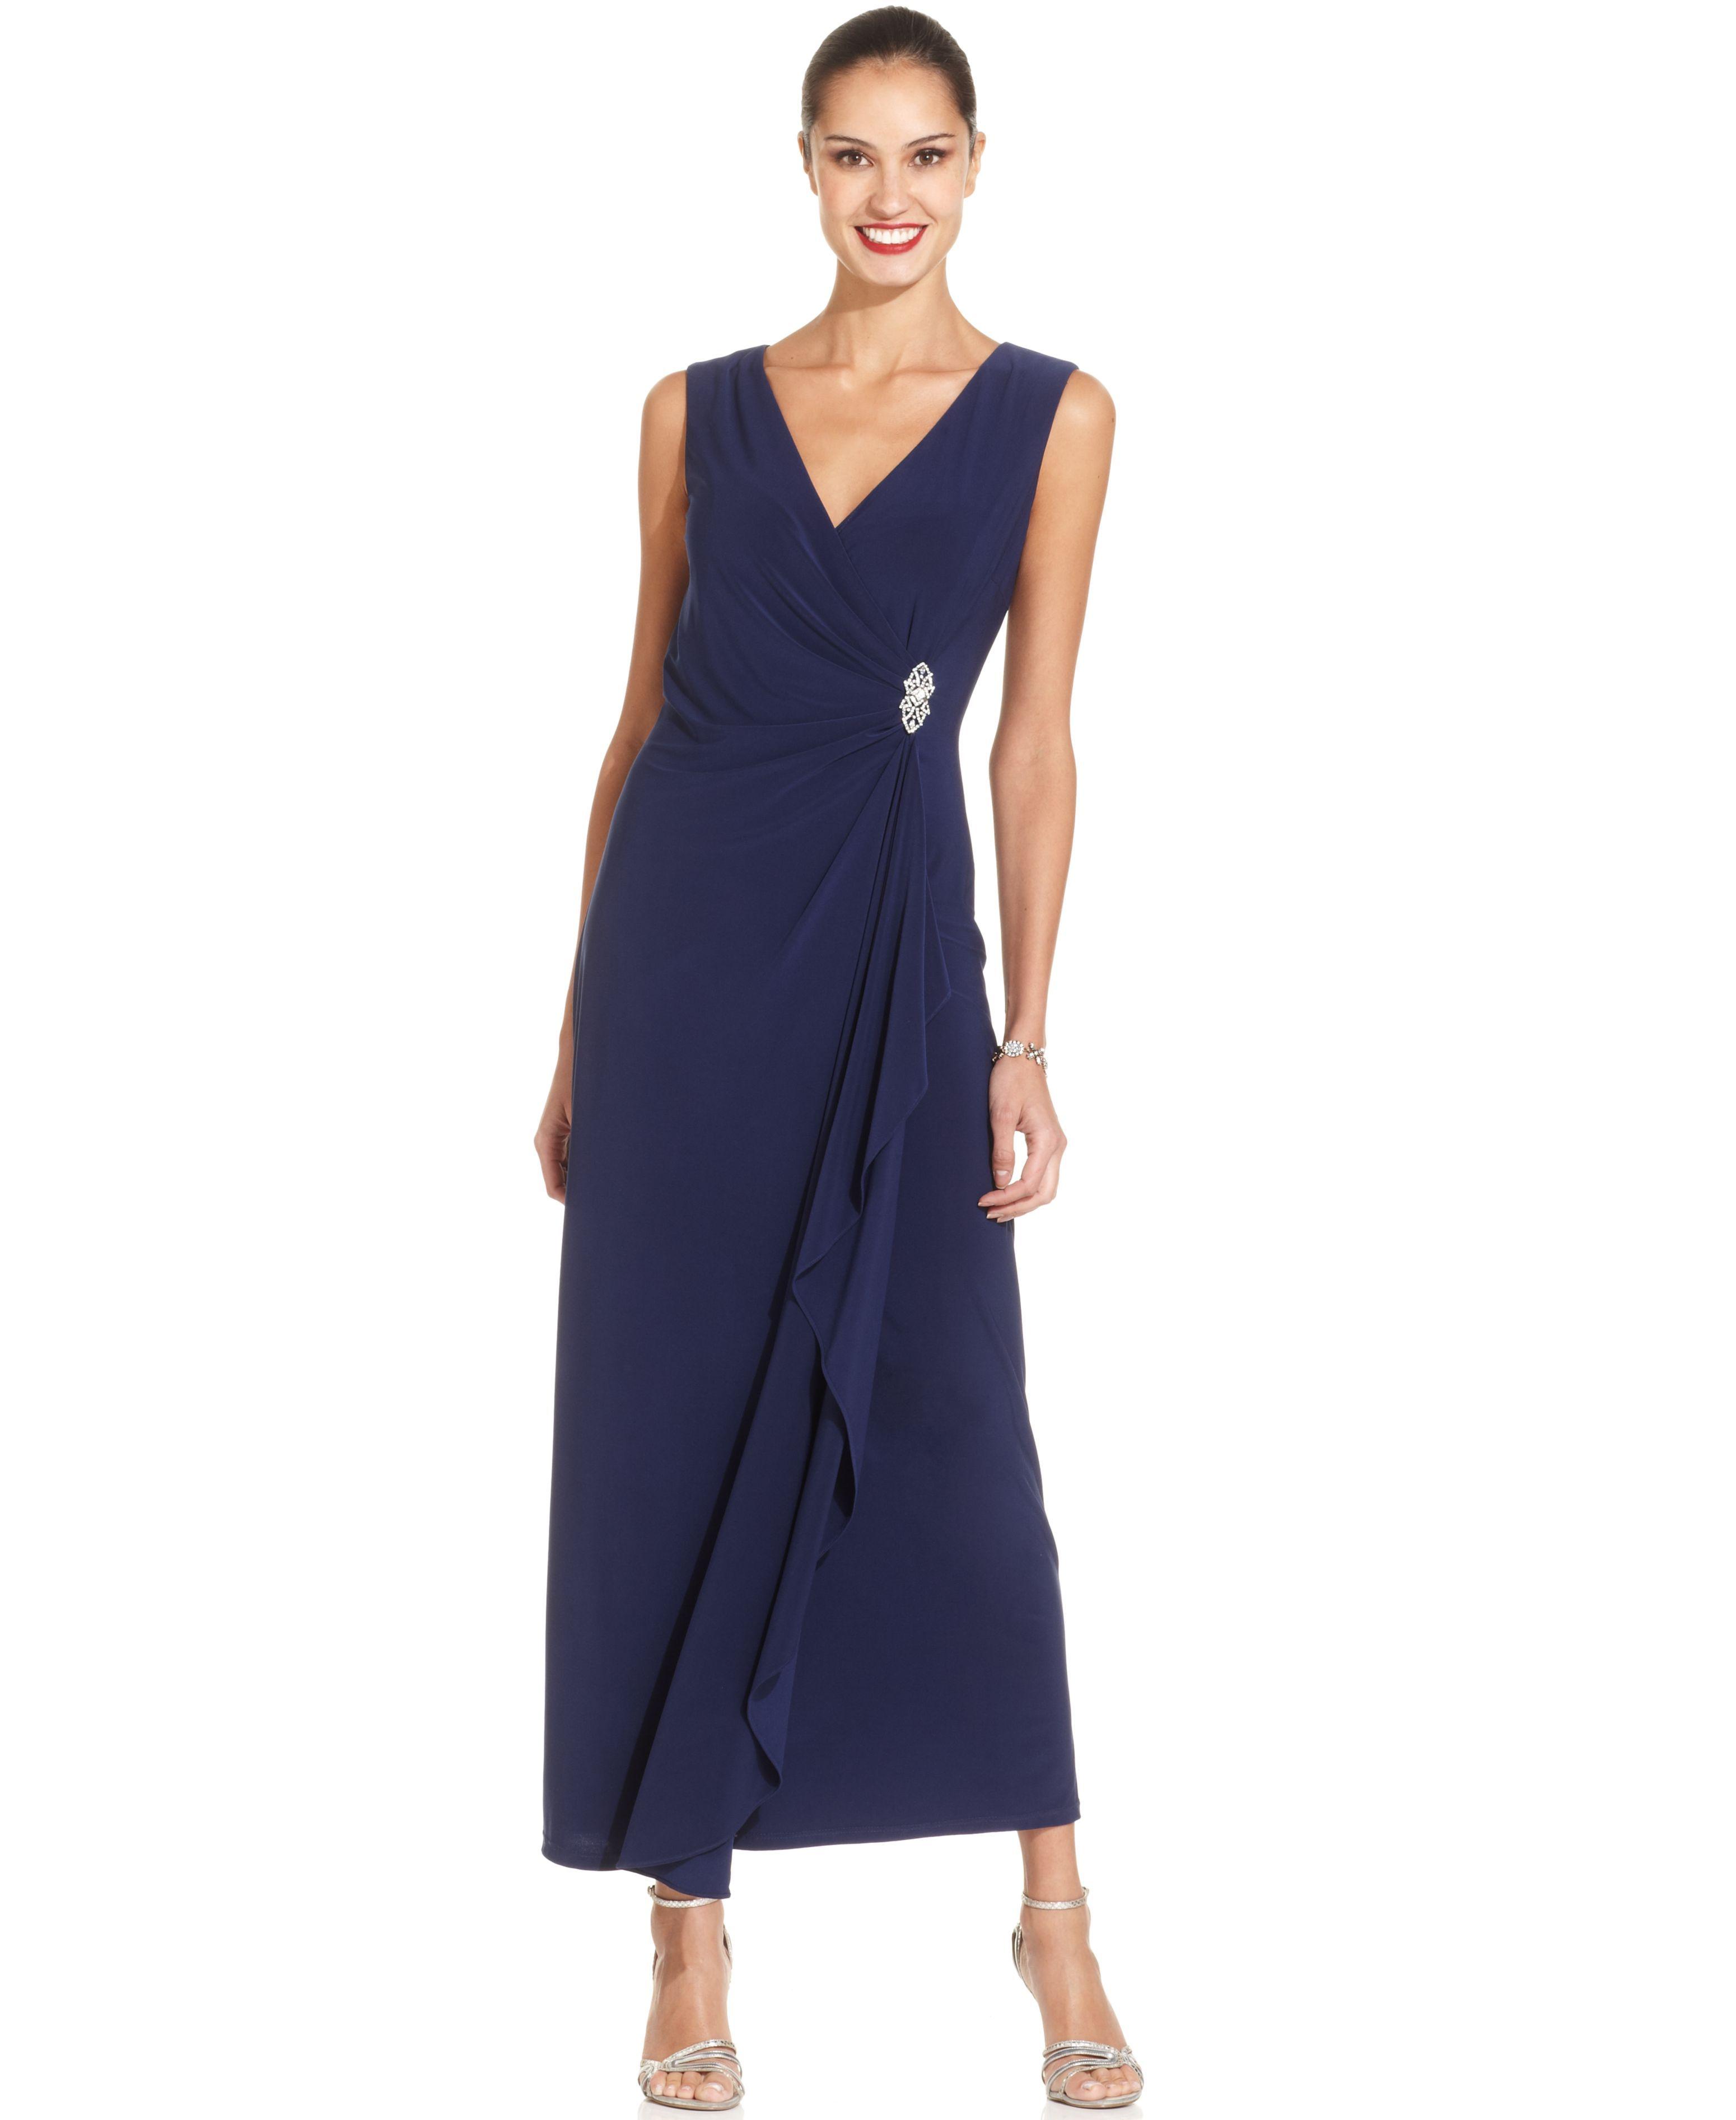 MACYS ---- dress ---- Lilian Queiroz ---- 6_fpx ----  Macy